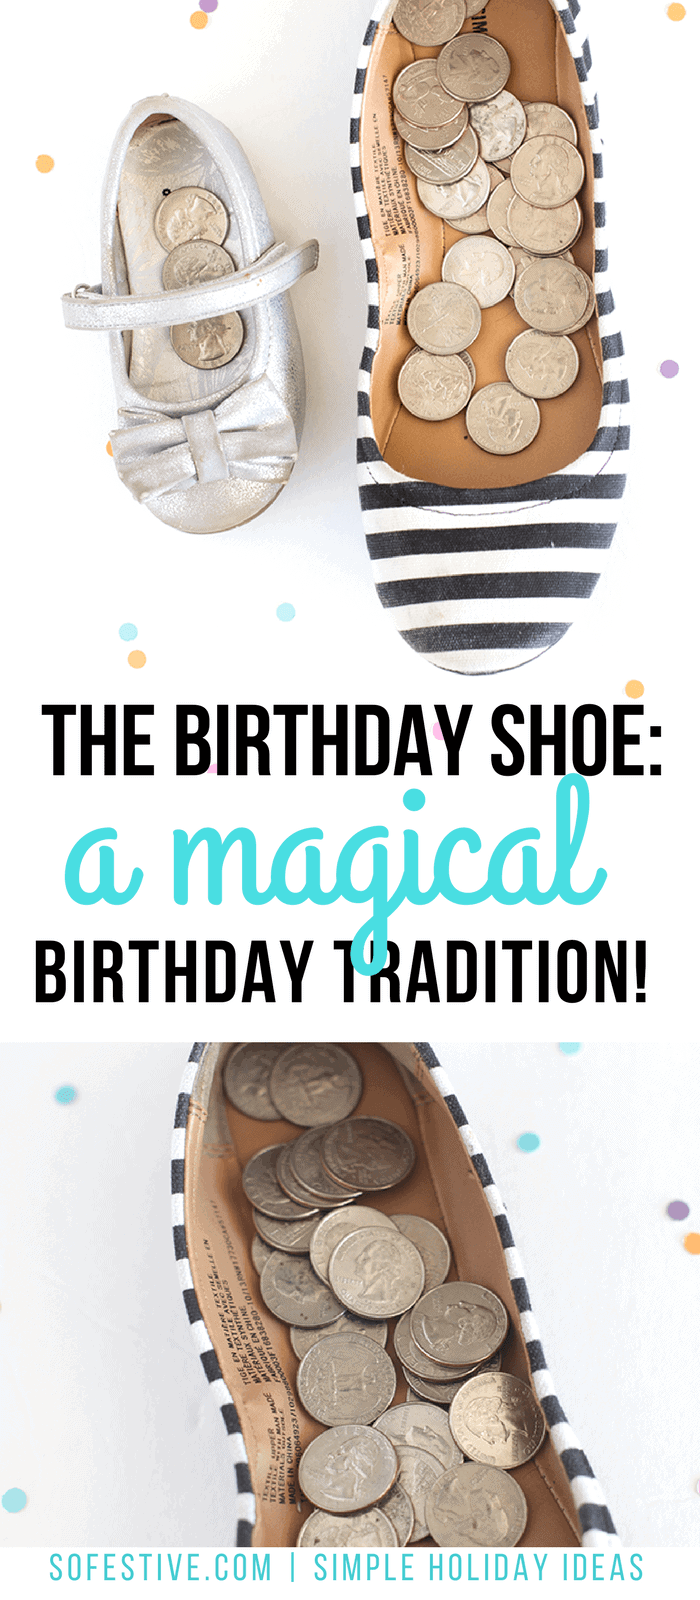 Birthday-tradition-idea